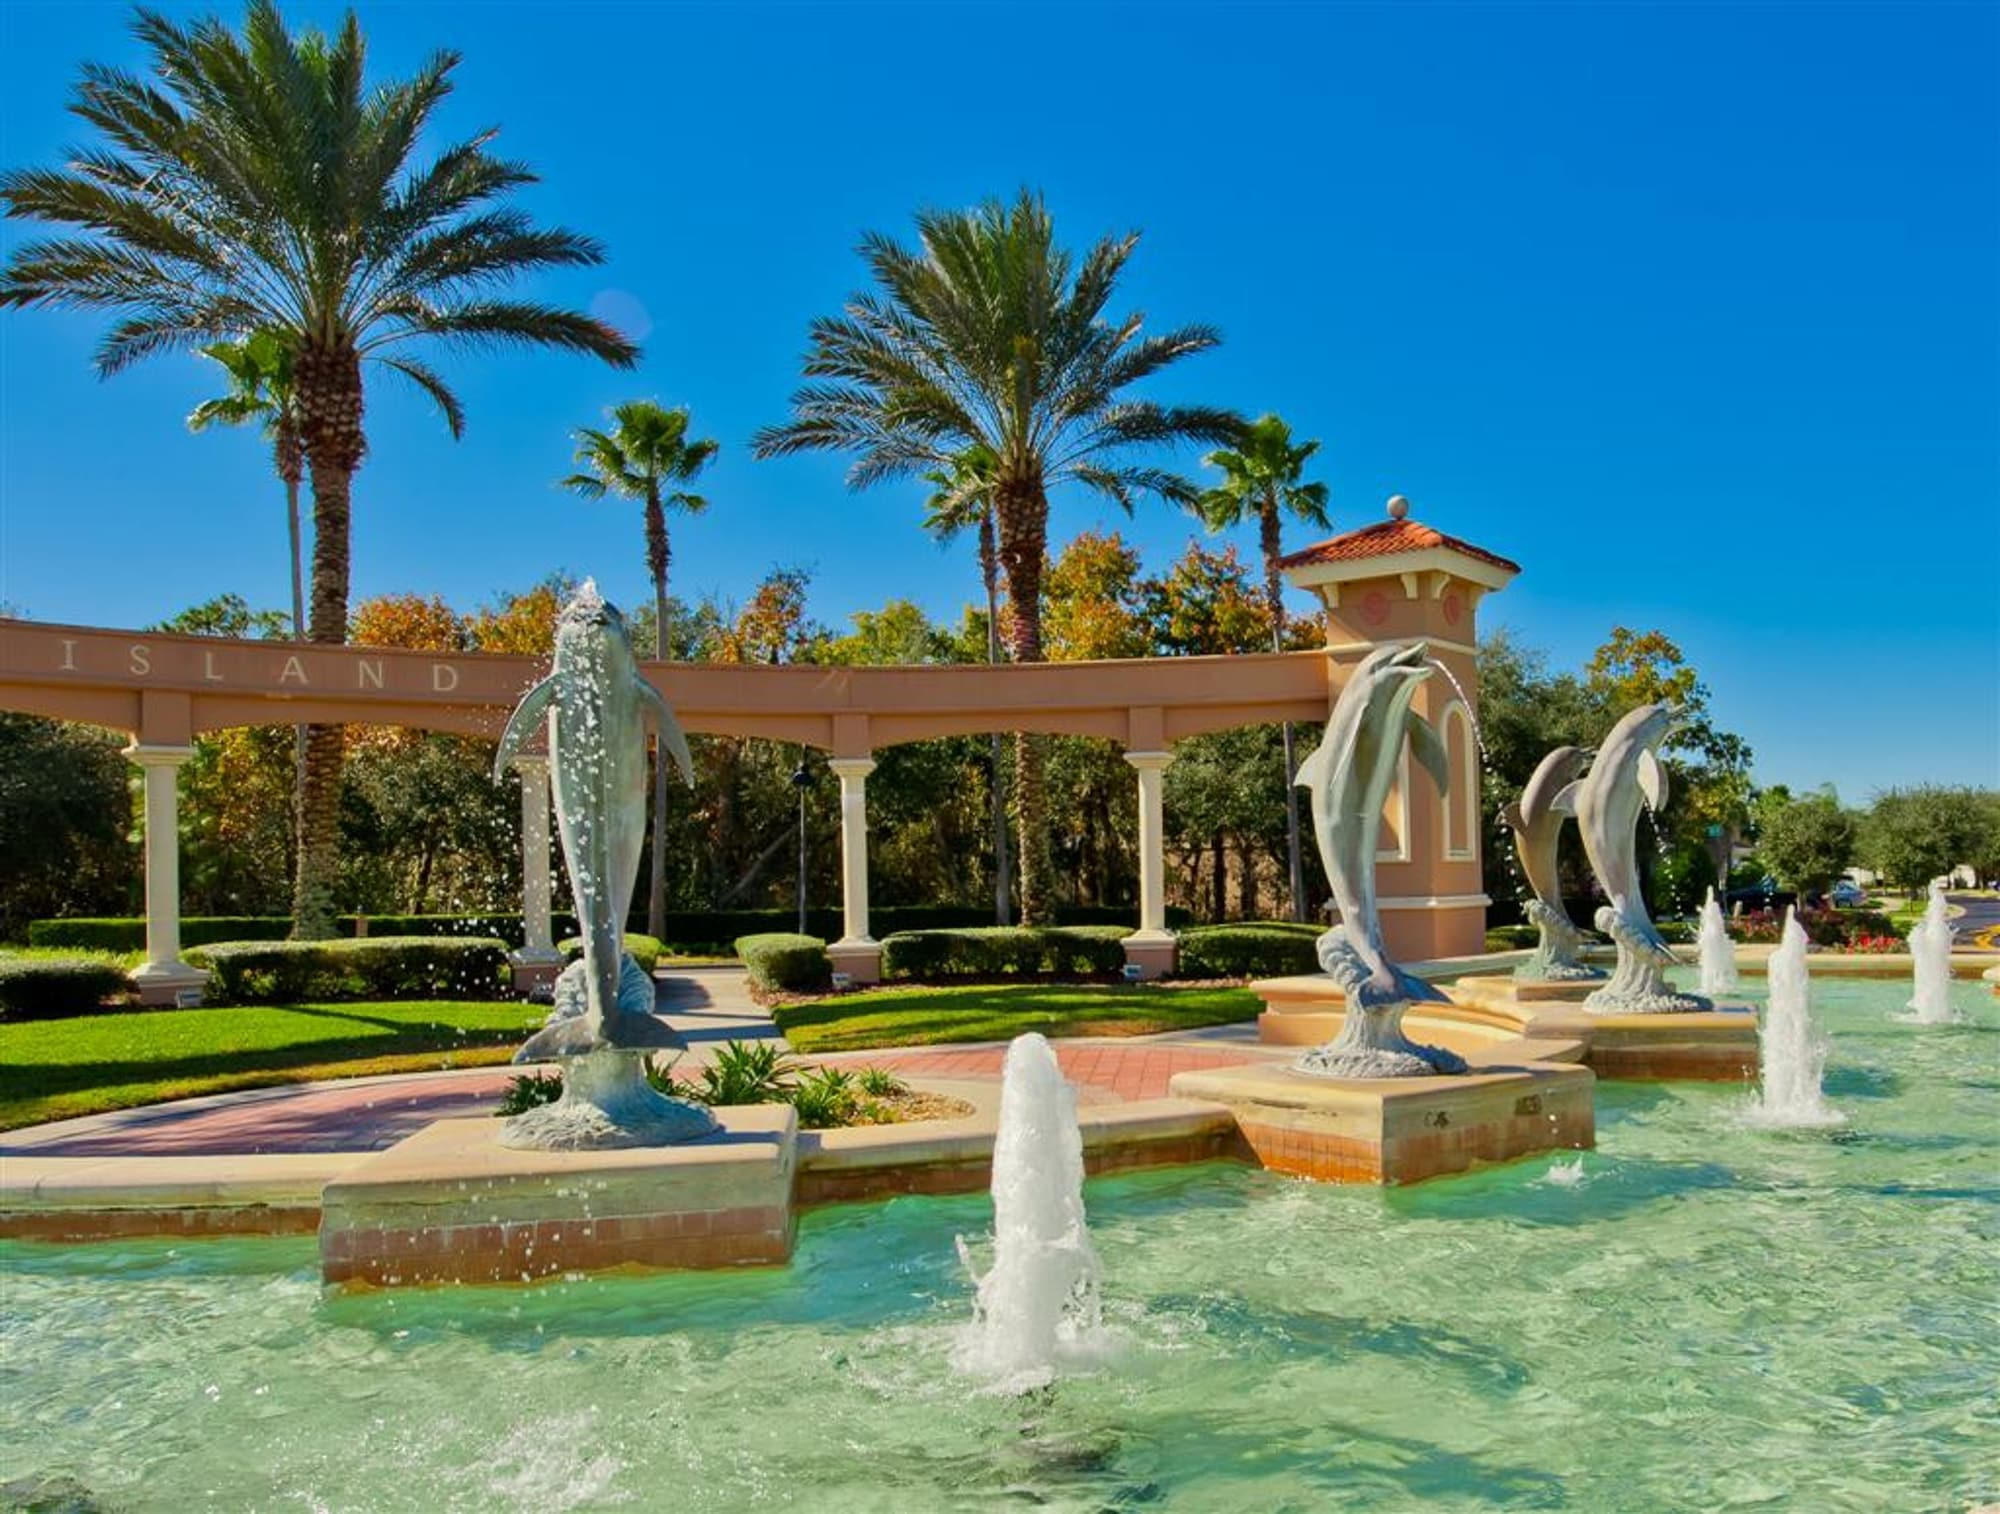 Emerald Island Resort - 8491 Oasis Key Cove Kissimmee